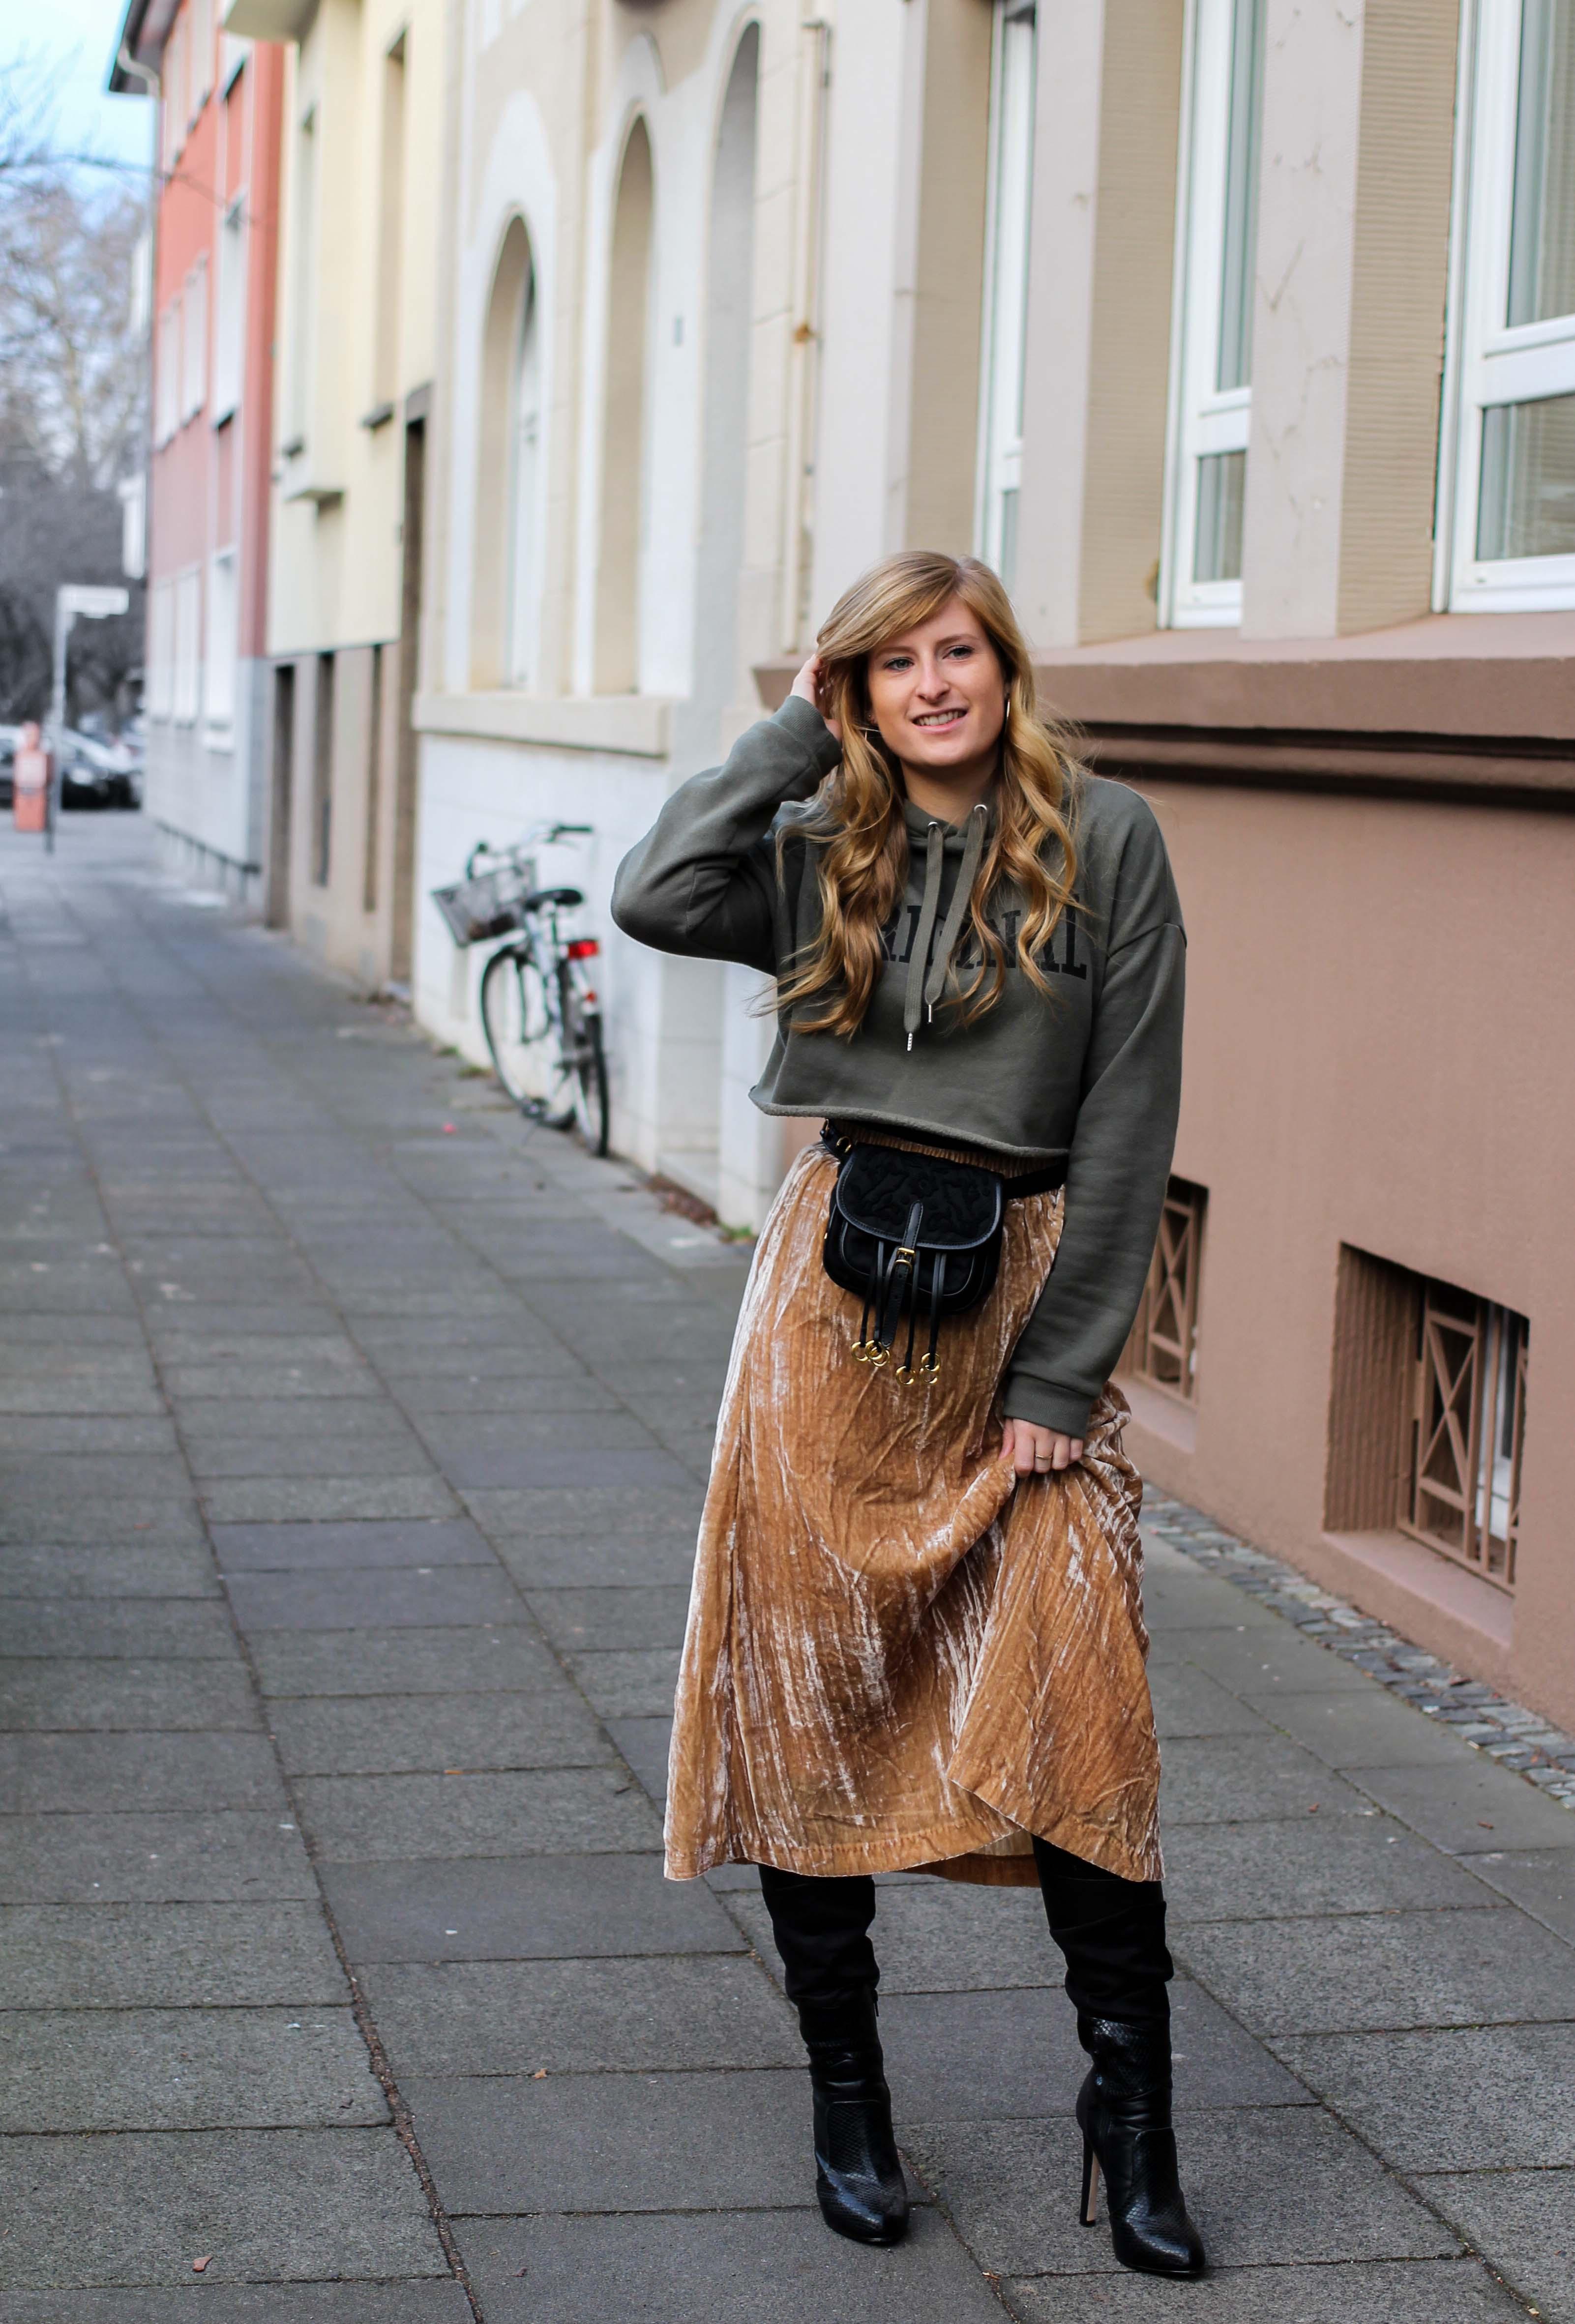 Trendtasche 2019 Gürteltasche kombiniern Gürteltasche Prada Streetstyle Outfit Bonn Frühling Look Crop Pullover 1